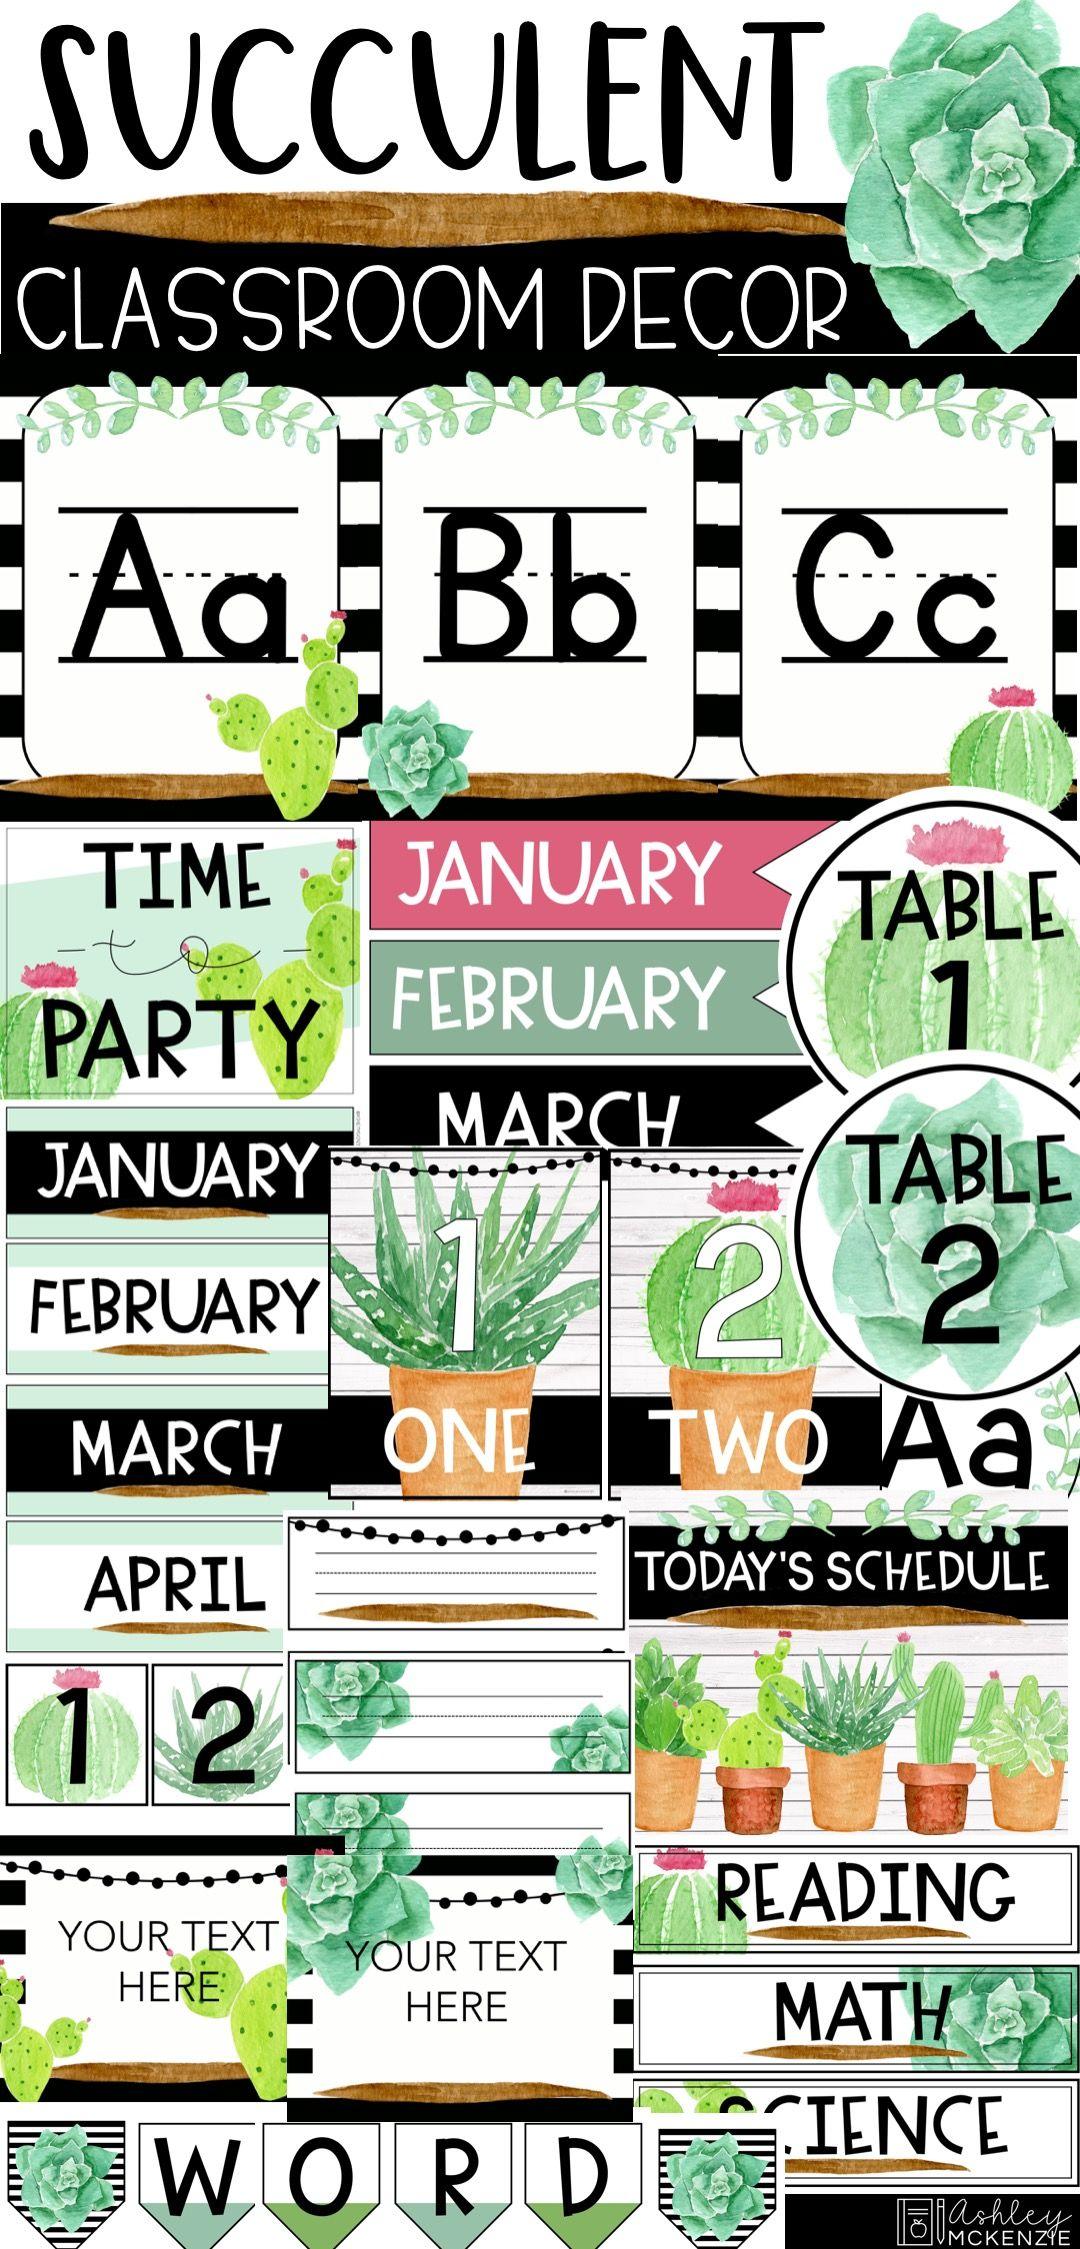 Watercolor Succulent Cactus Classroom Decor Classroom Themes